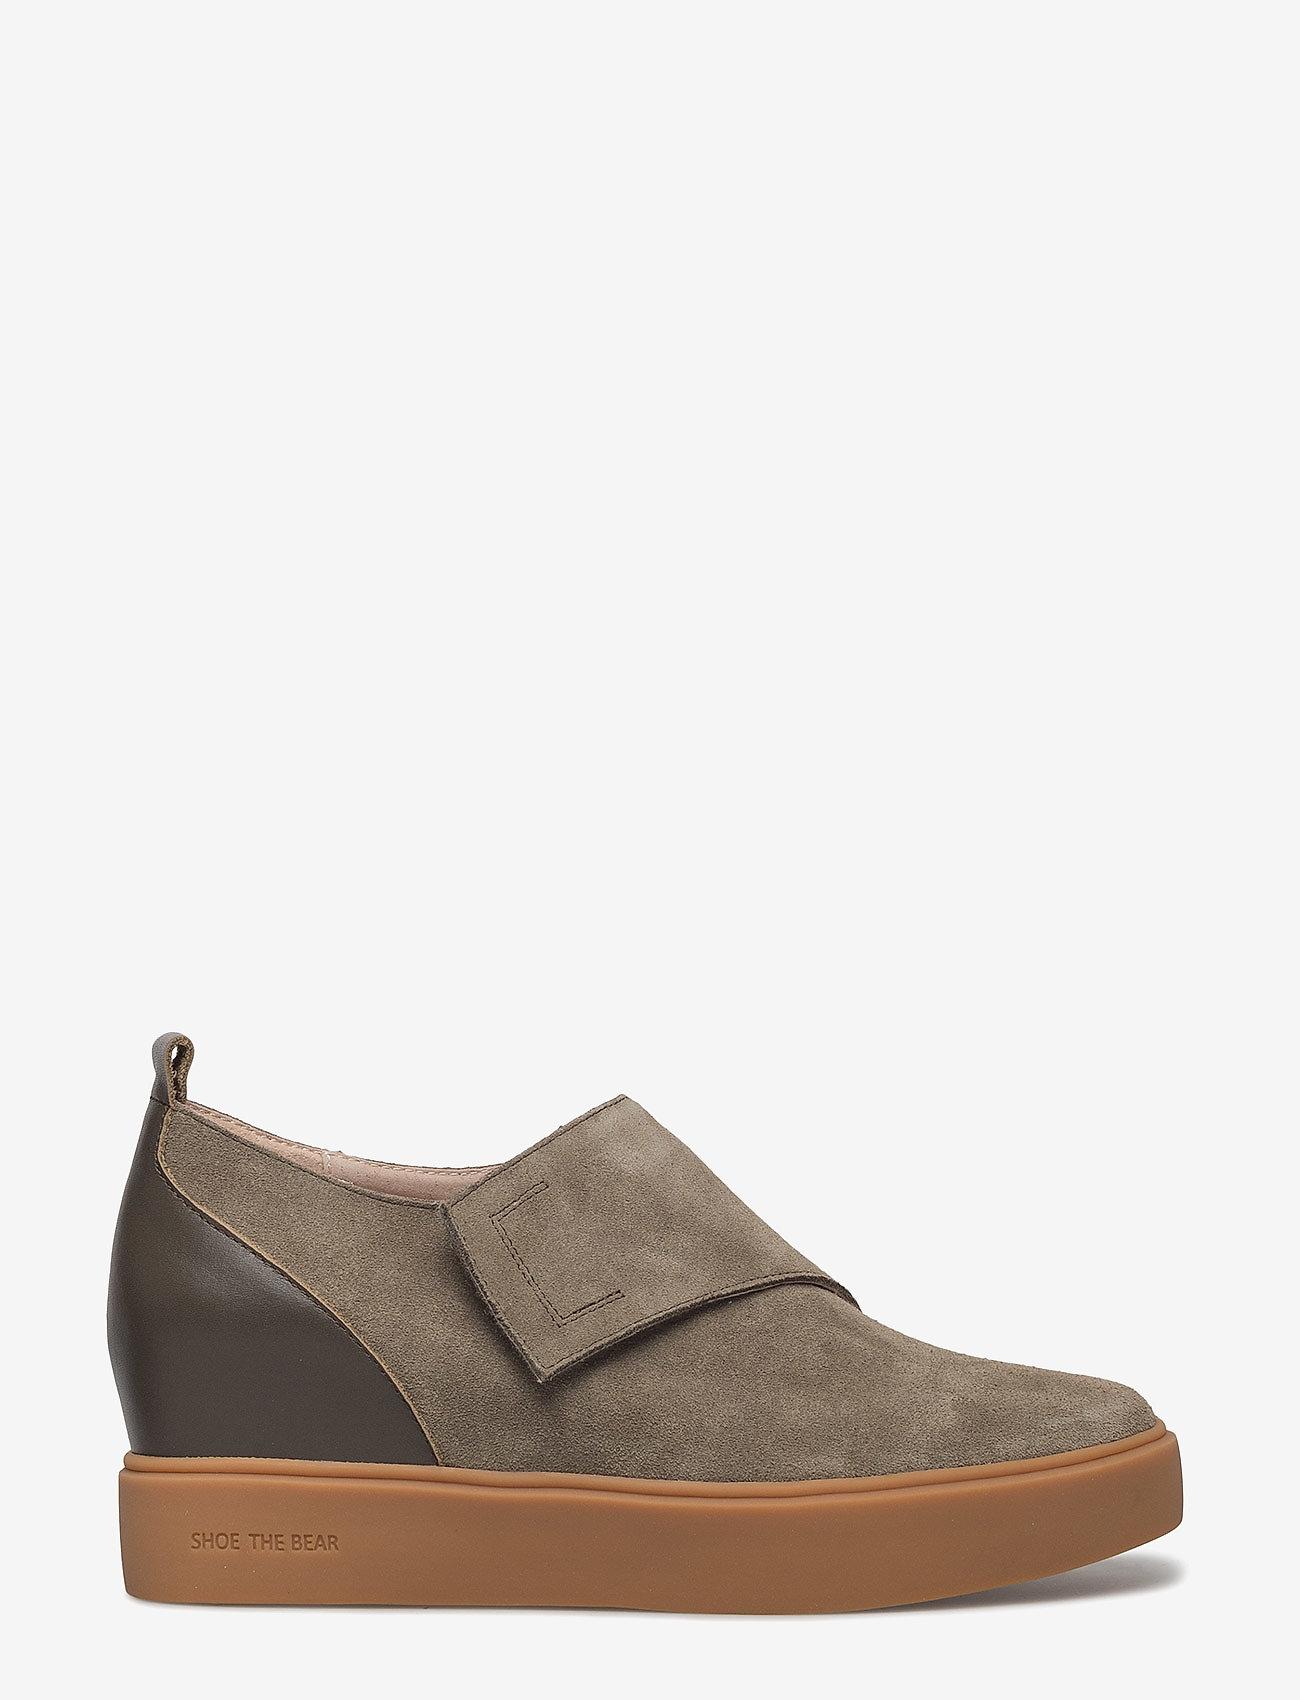 Shoe The Bear - LISA S - chunky sneakers - green - 1